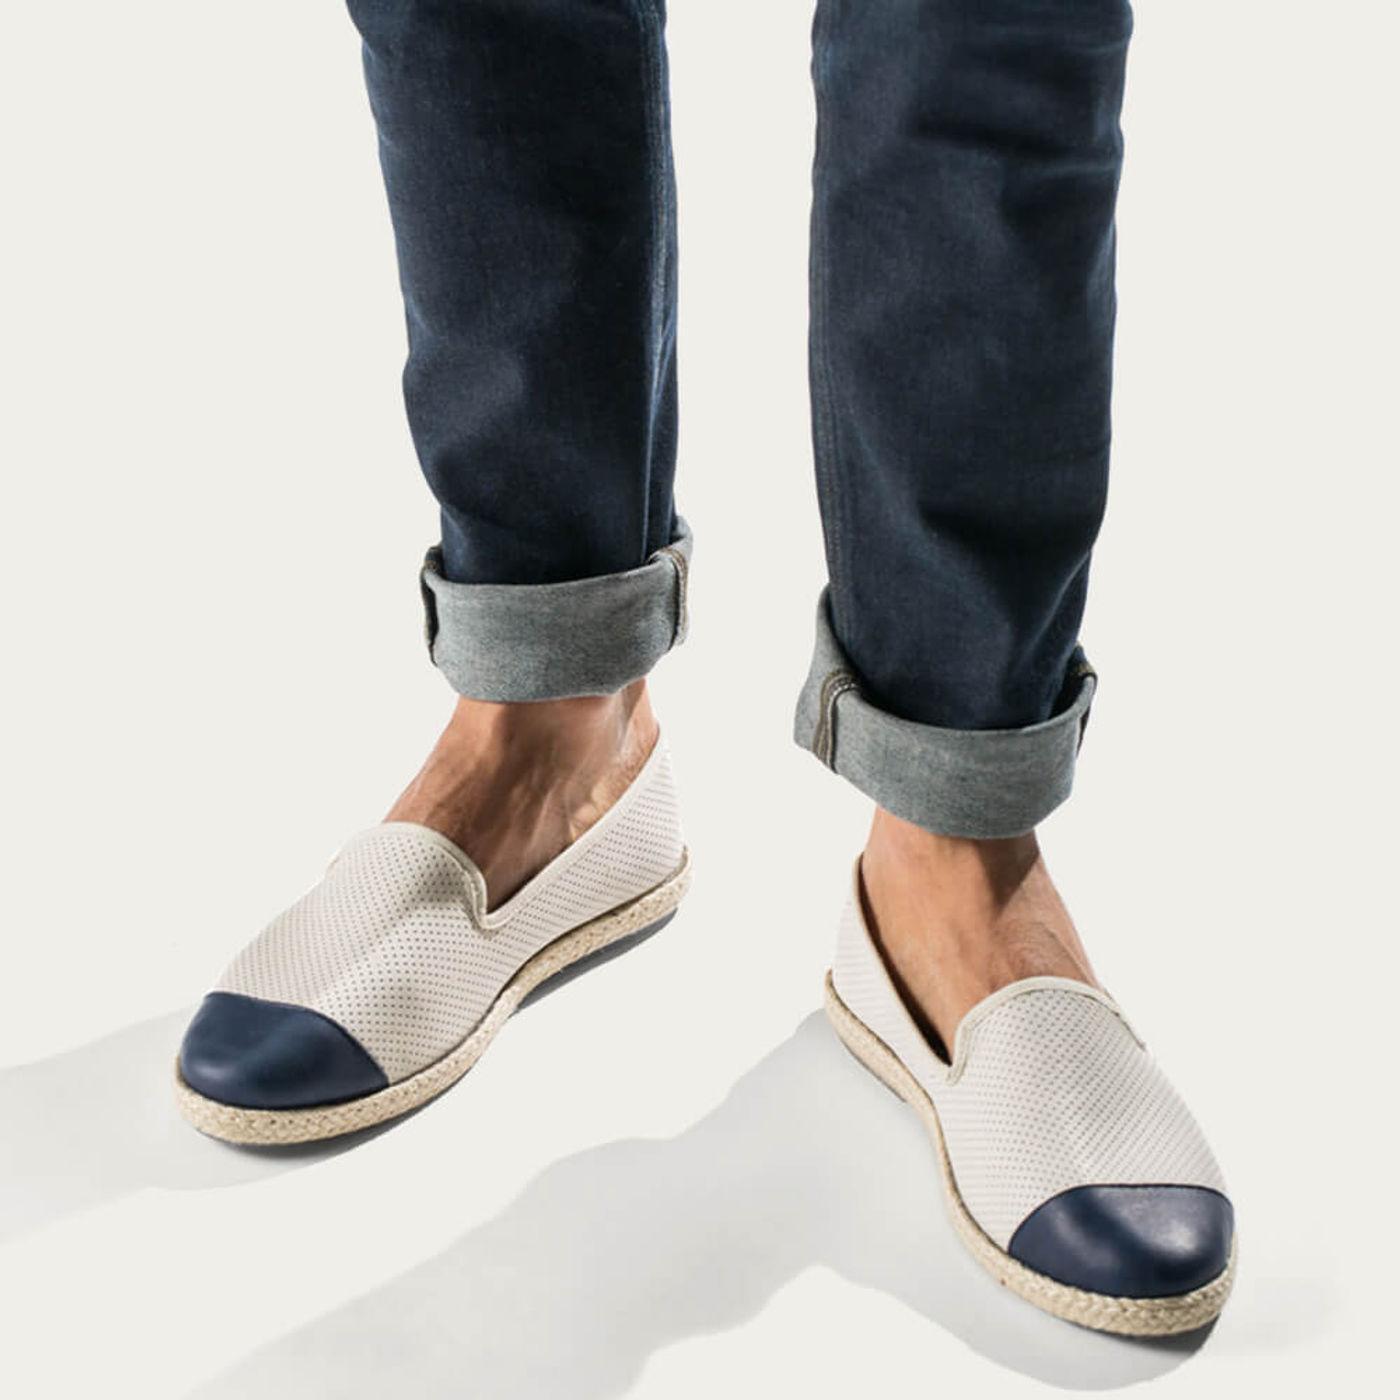 Dual Men's Espadrille Slip-On Leather | Bombinate